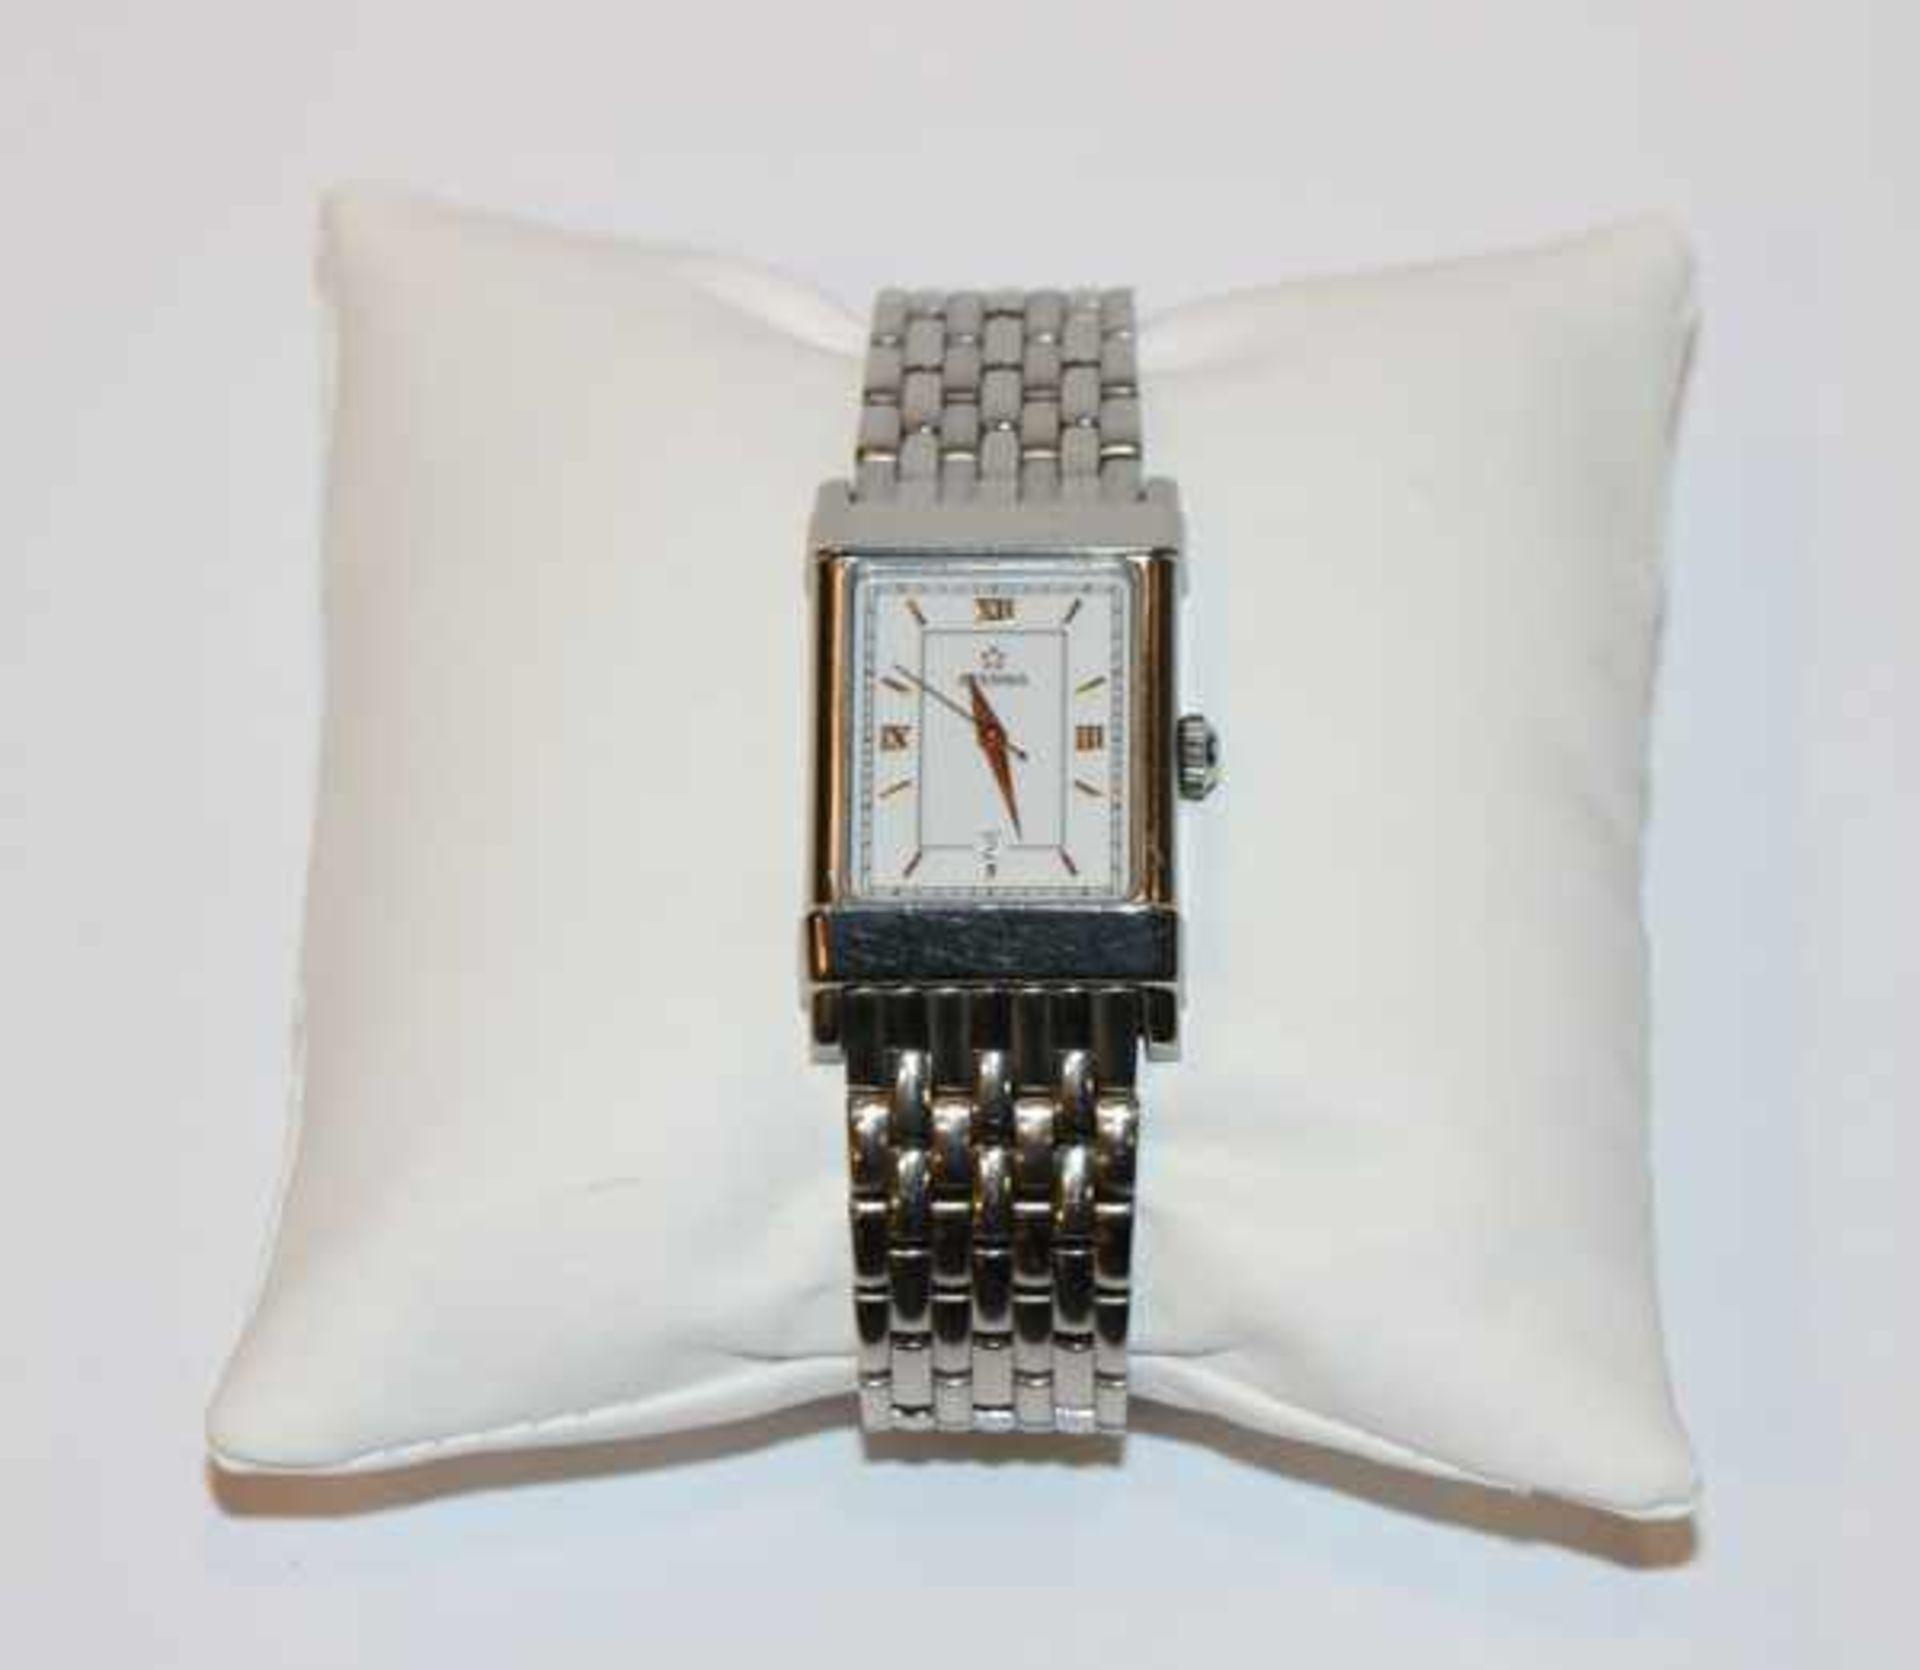 Los 54 - Eterna Damen Armbanduhr, Automatik, Stahl, mit Papieren in Originaletui, Tragespuren